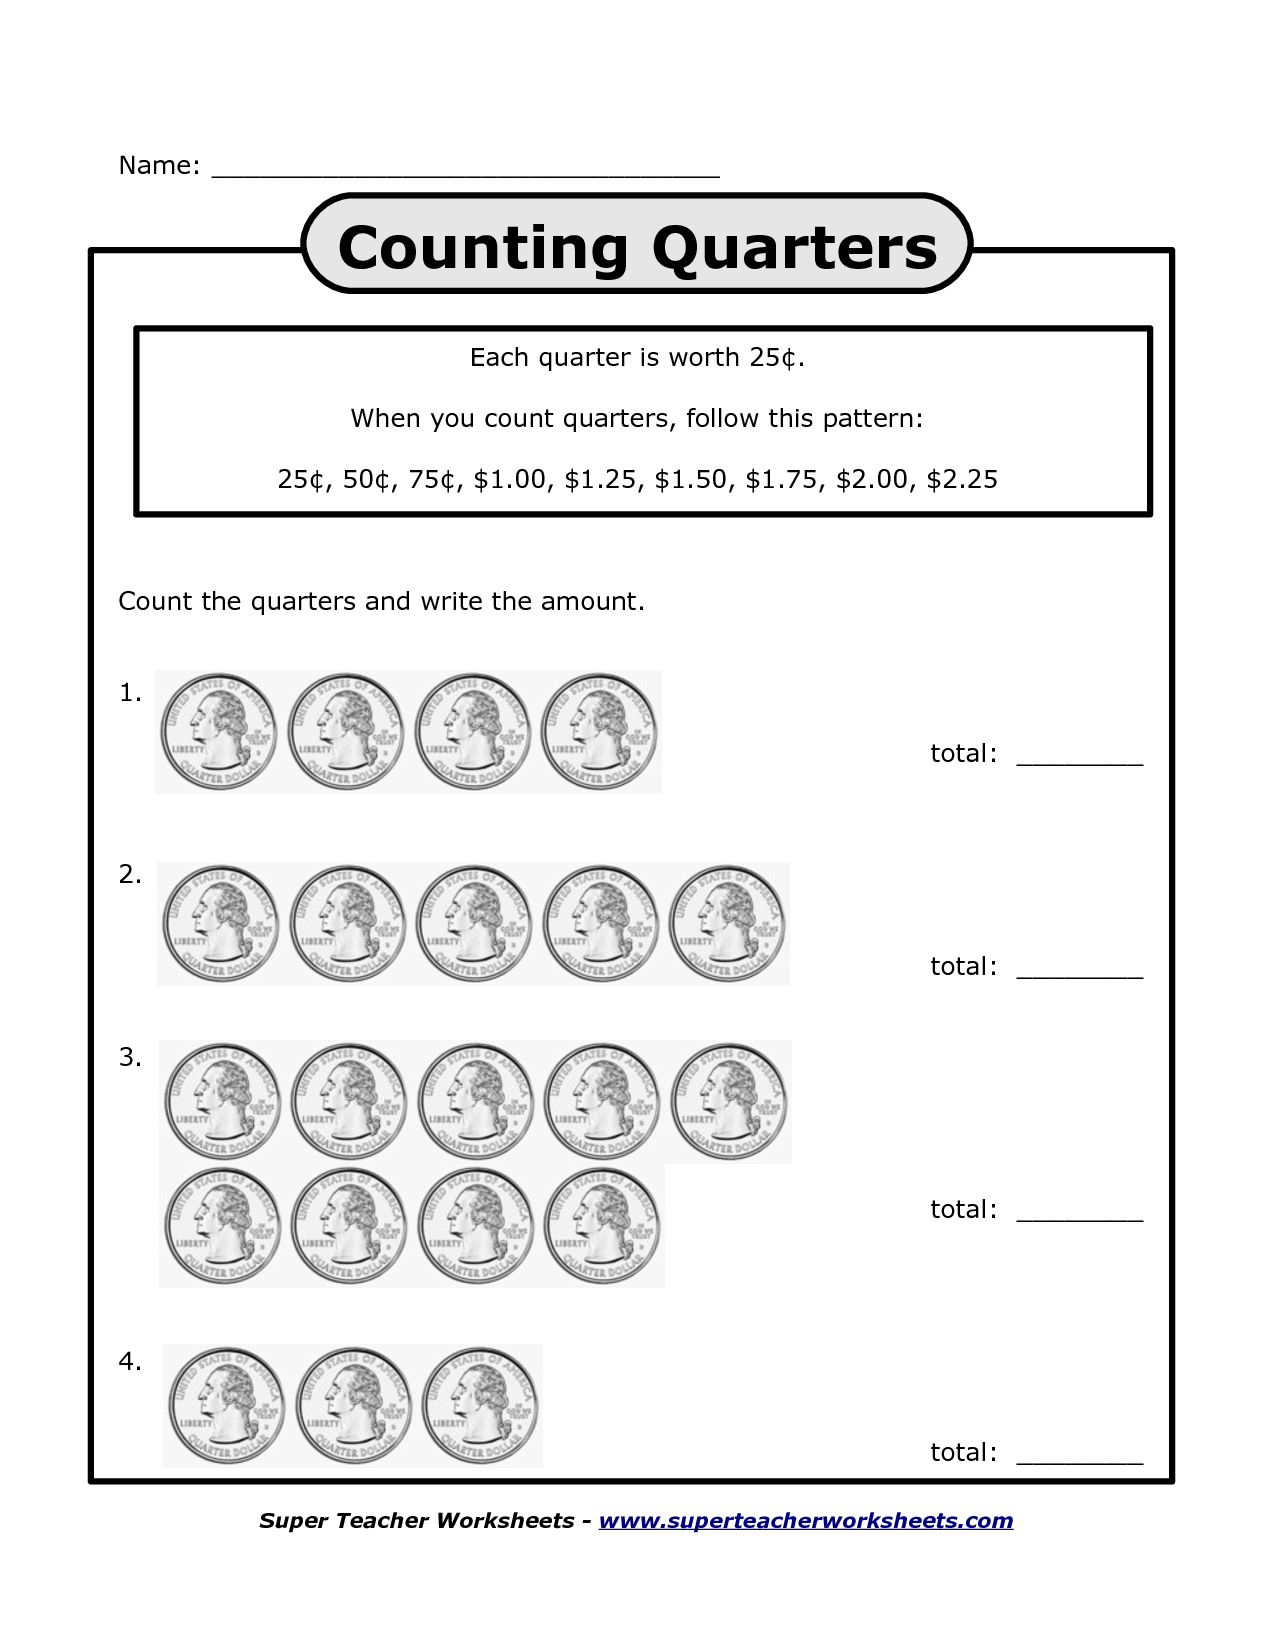 medium resolution of Counting Quarters Worksheets - Bing Images   Super teacher worksheets